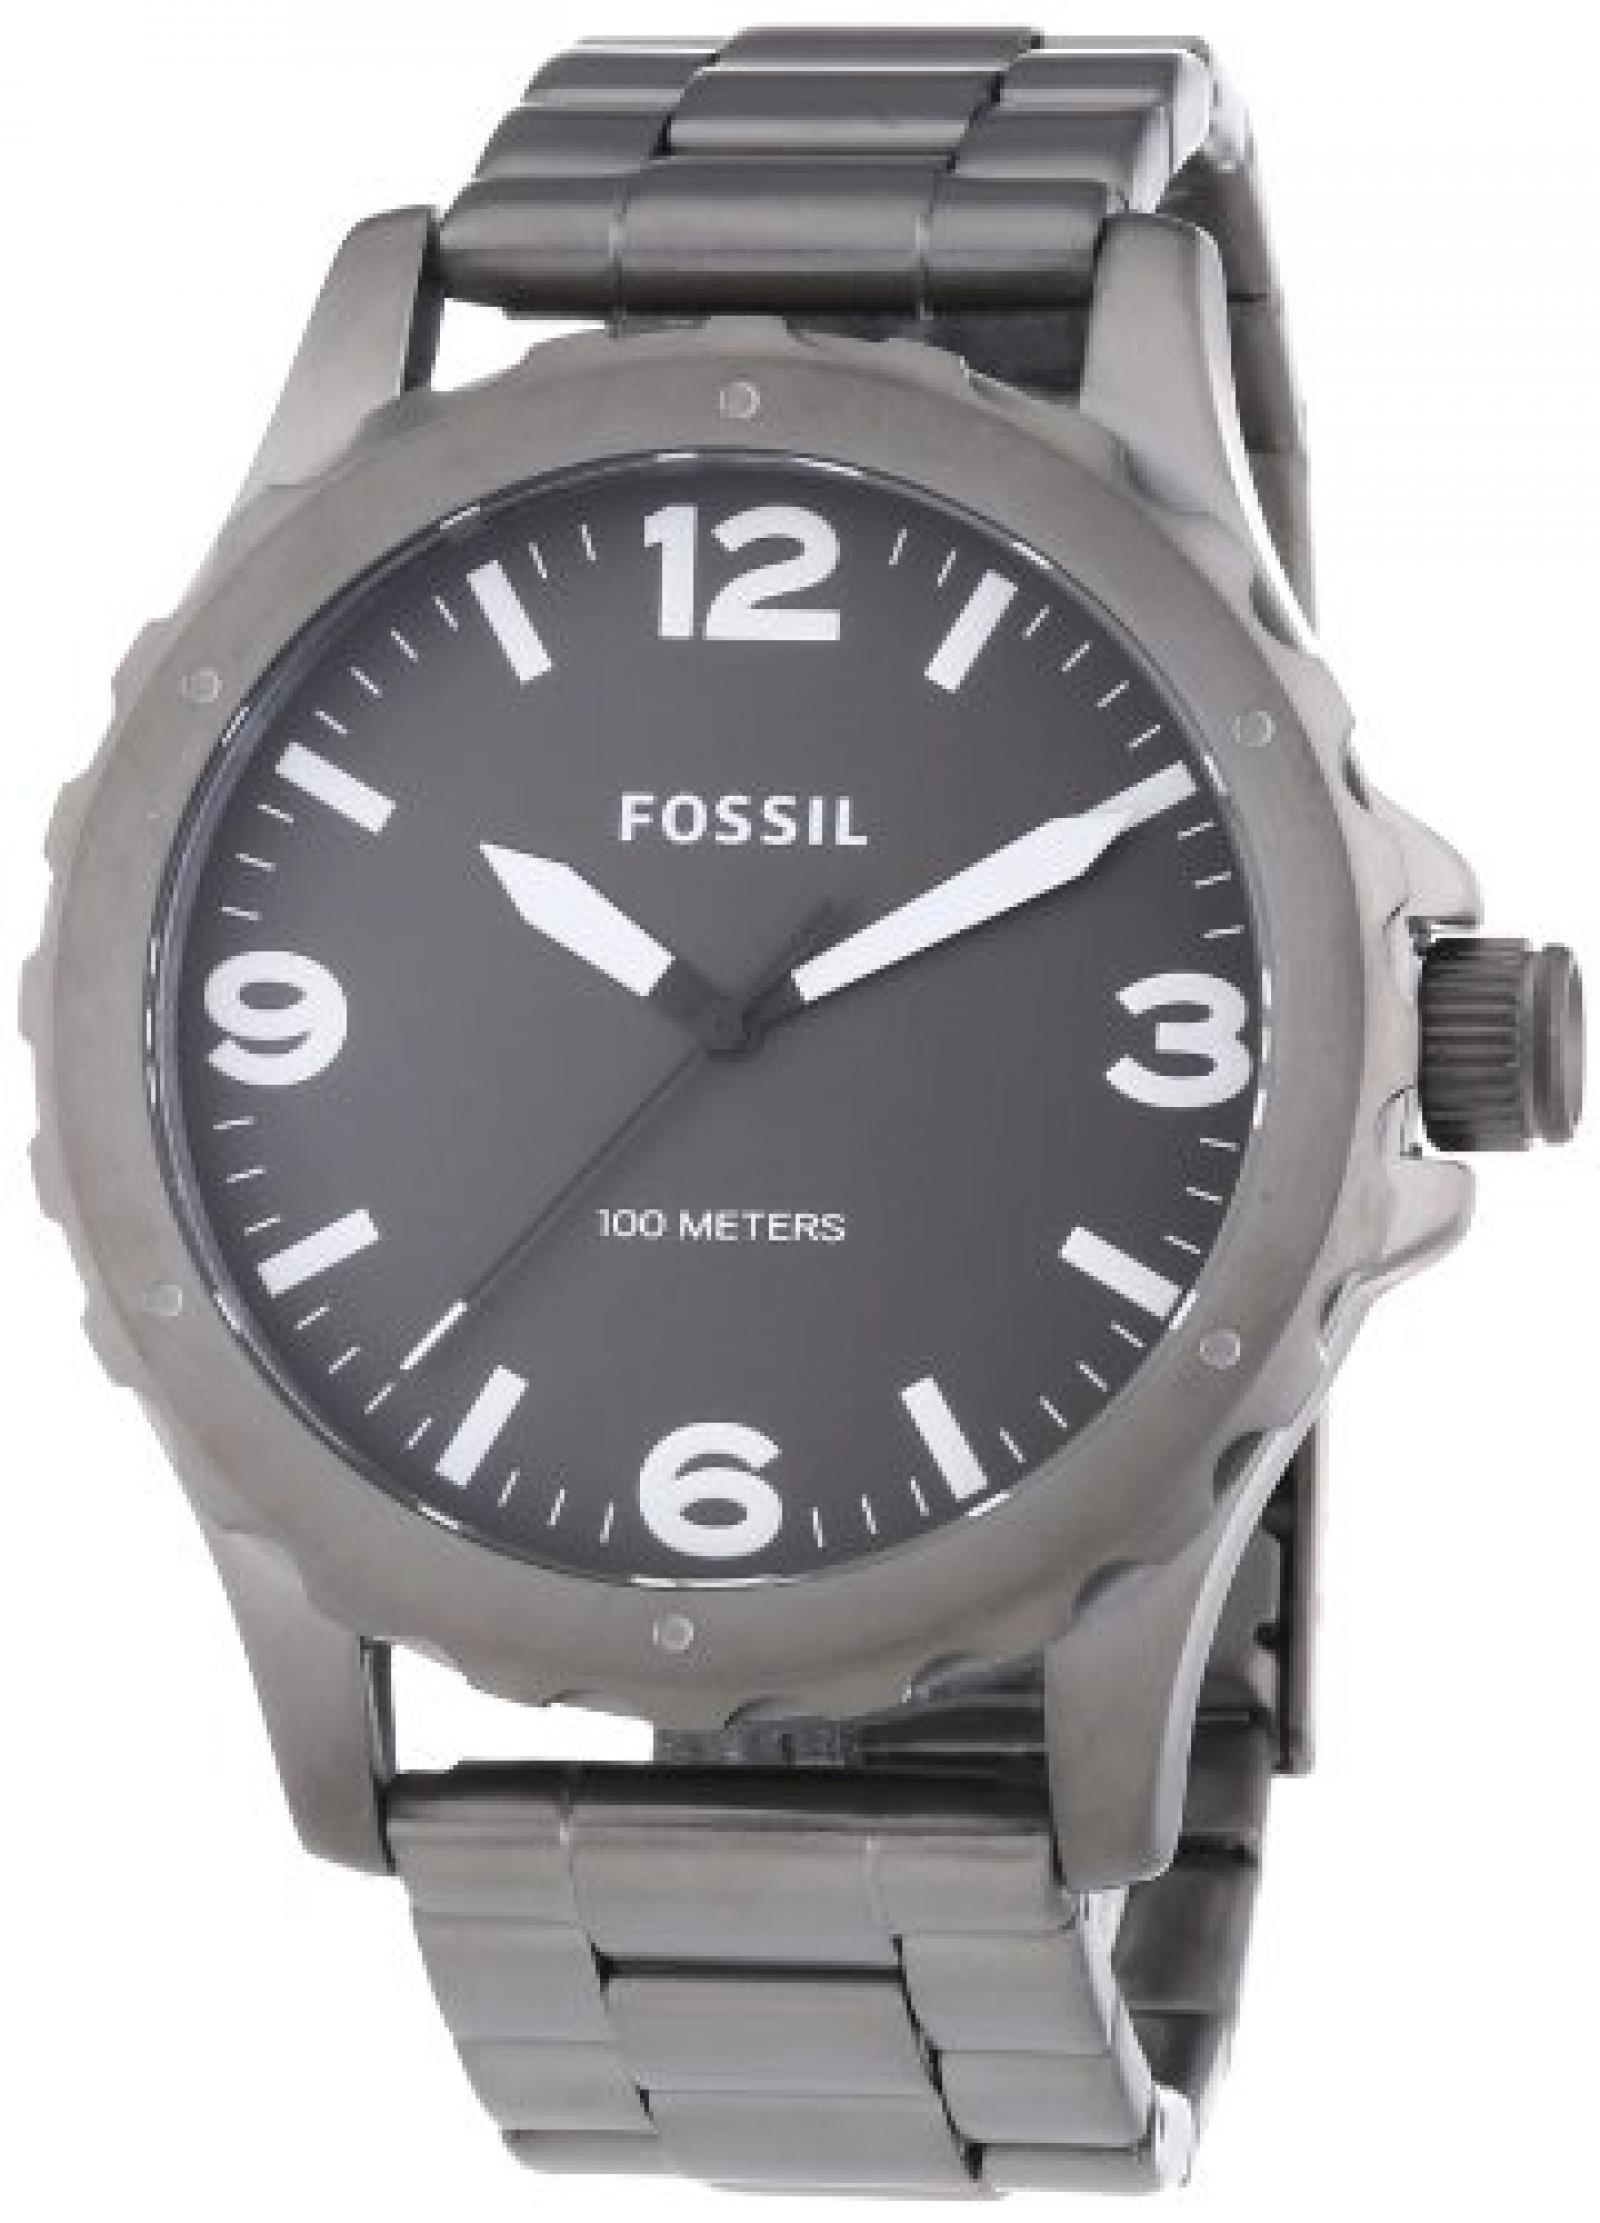 Fossil Herren-Armbanduhr XL Nate Analog Quarz Edelstahl beschichtet JR1457